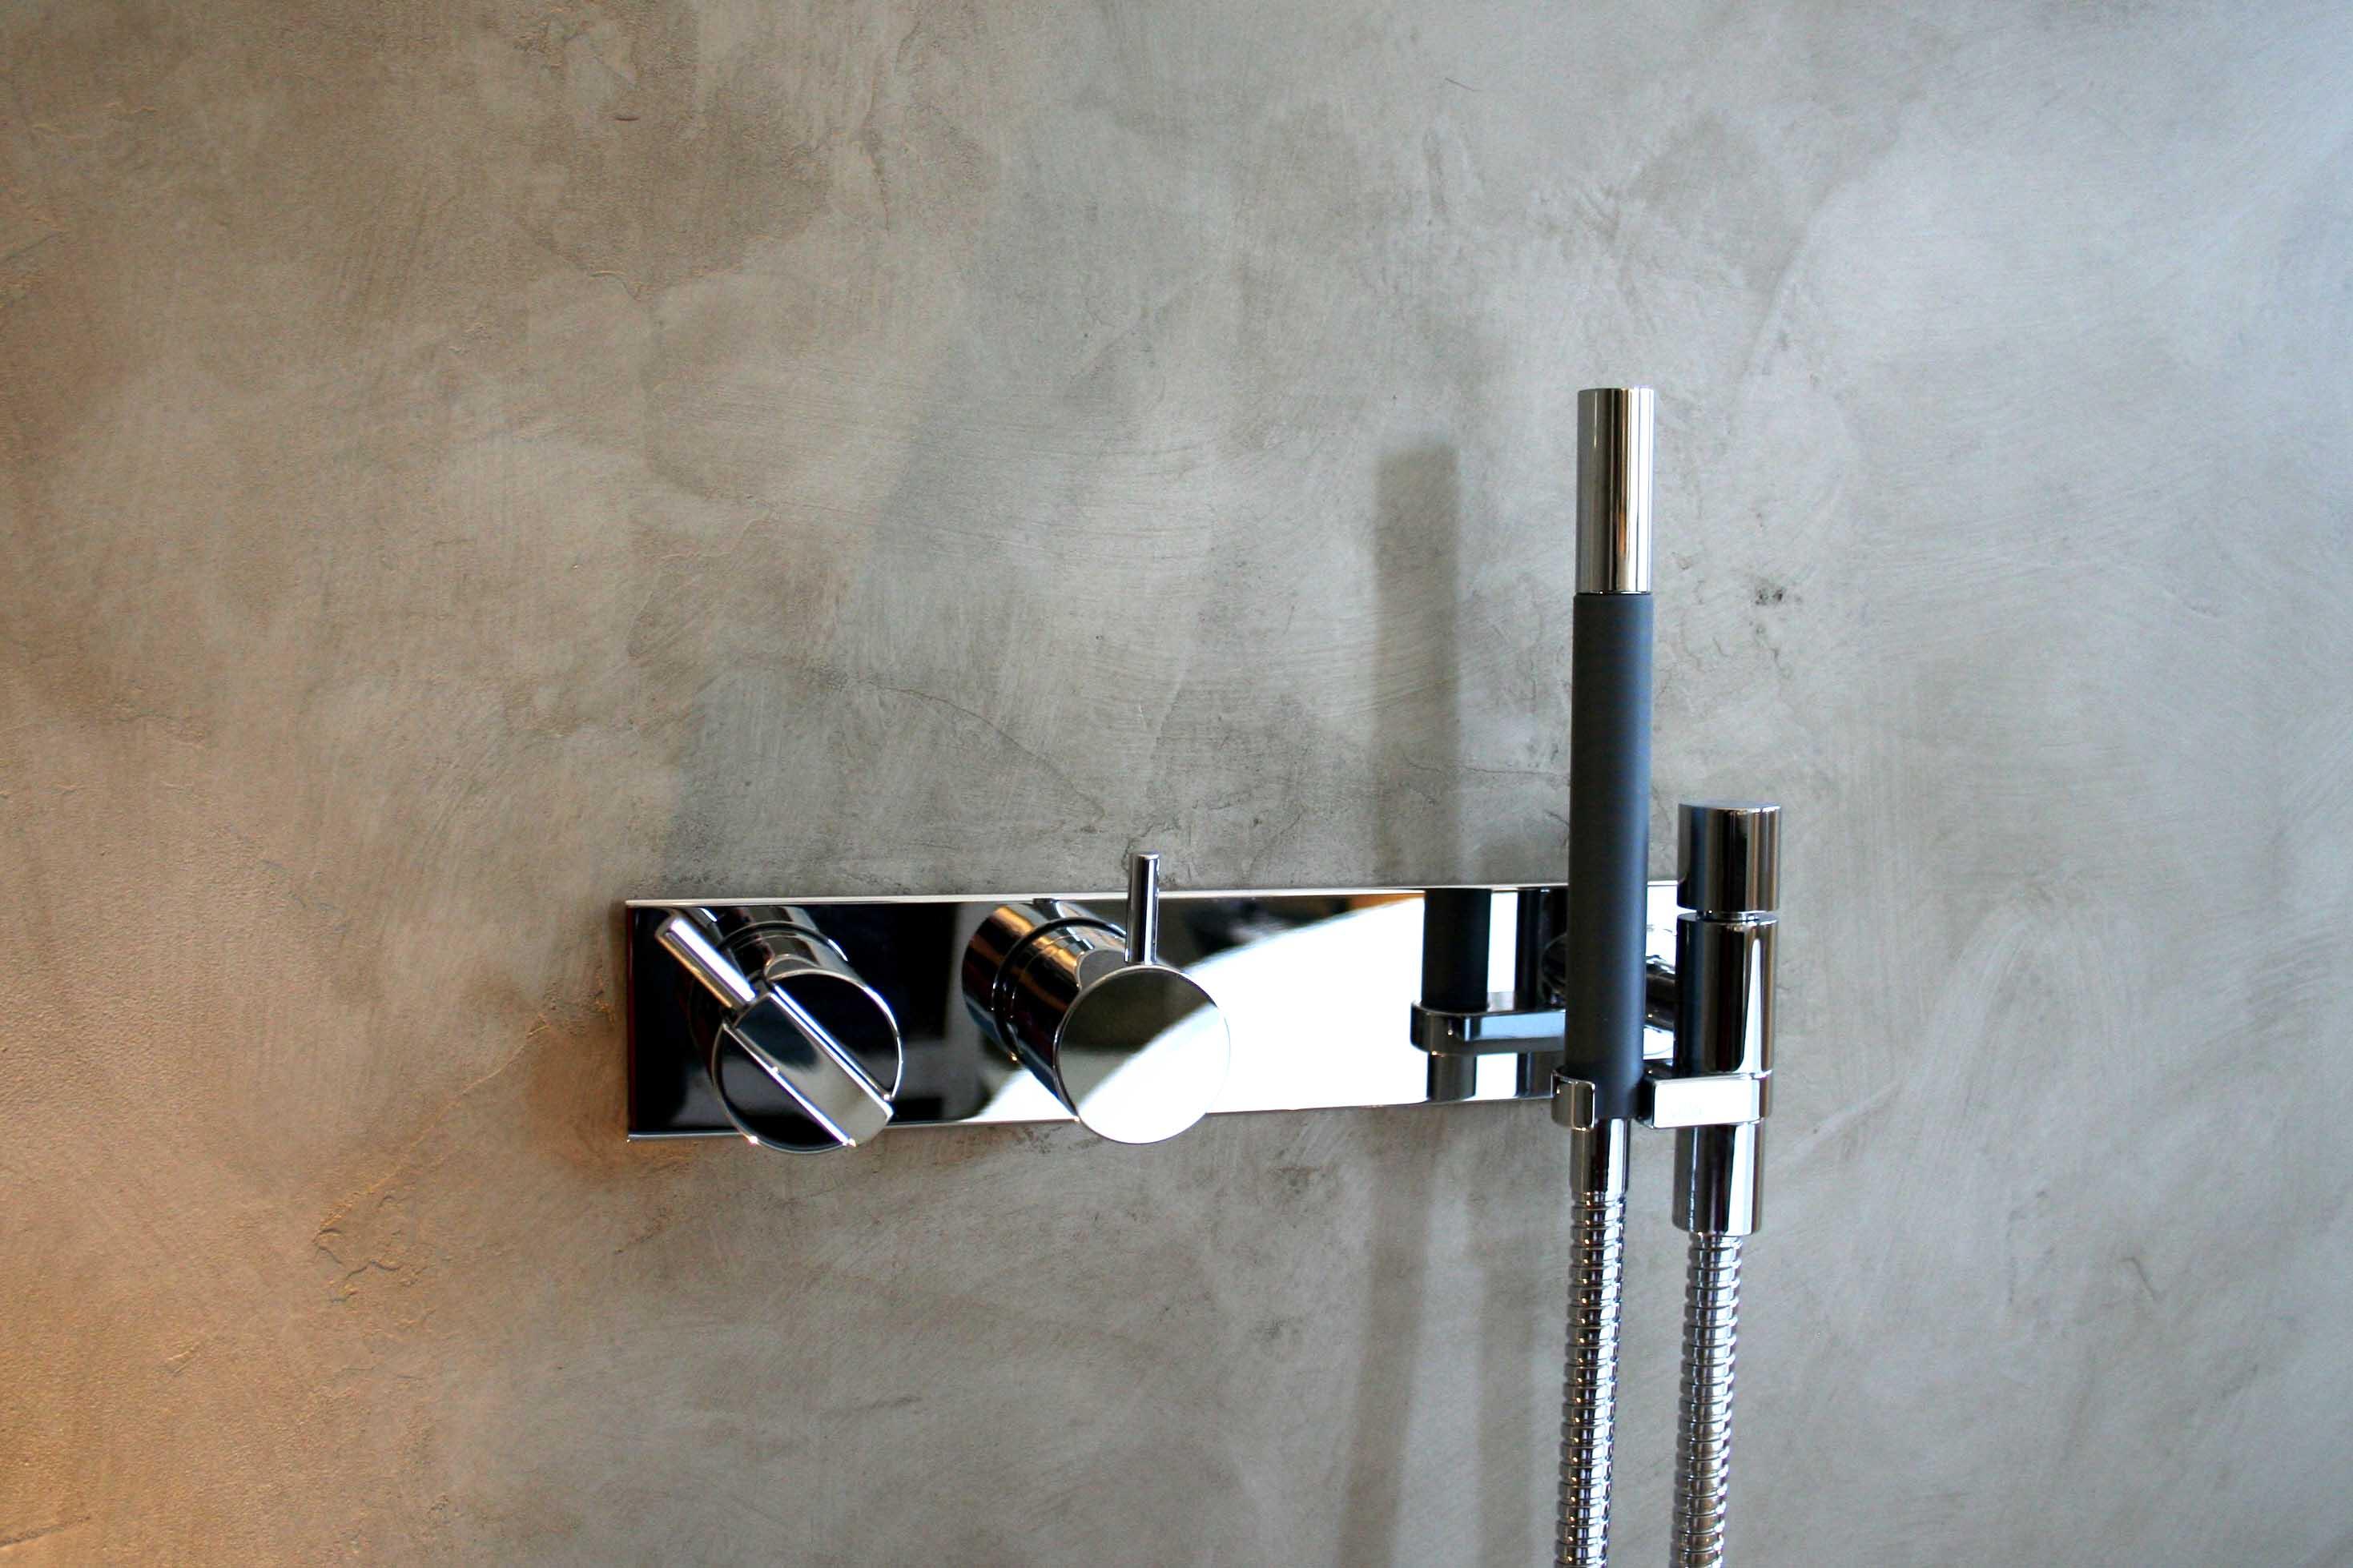 edle badezimmer badtraces anthrazit badezimmer grau. Black Bedroom Furniture Sets. Home Design Ideas